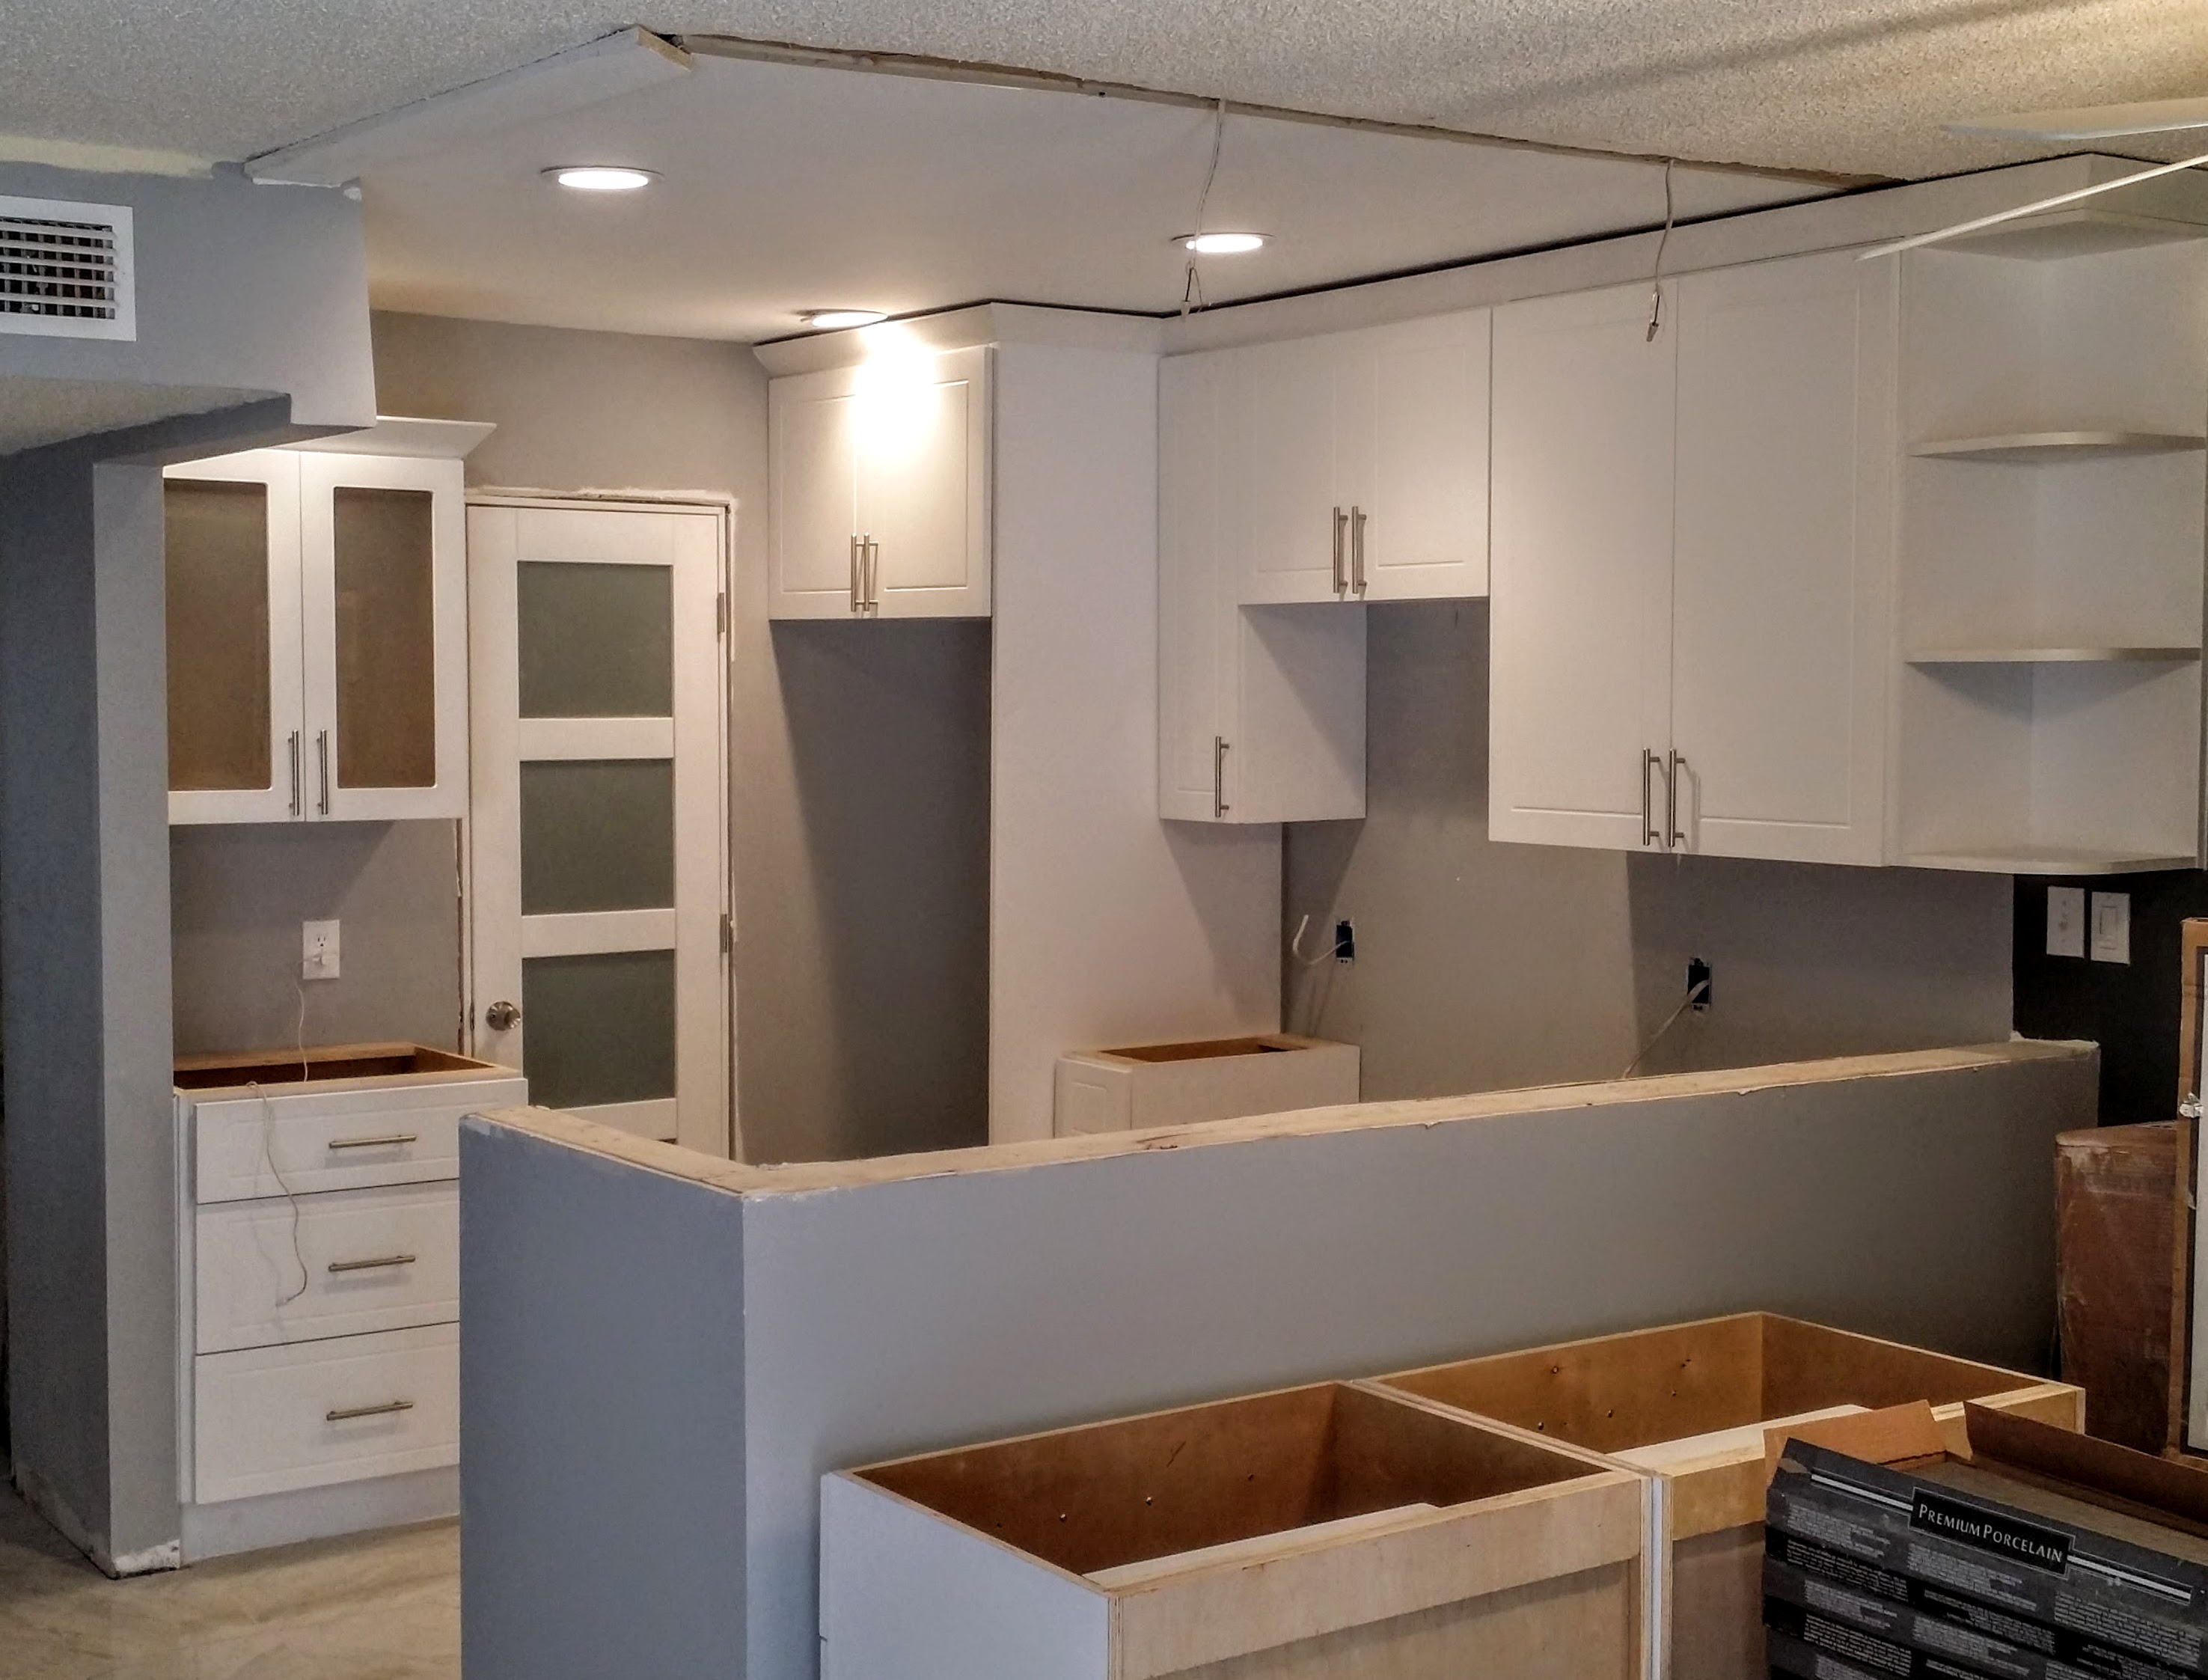 Kitchen Remodel Start to Finish